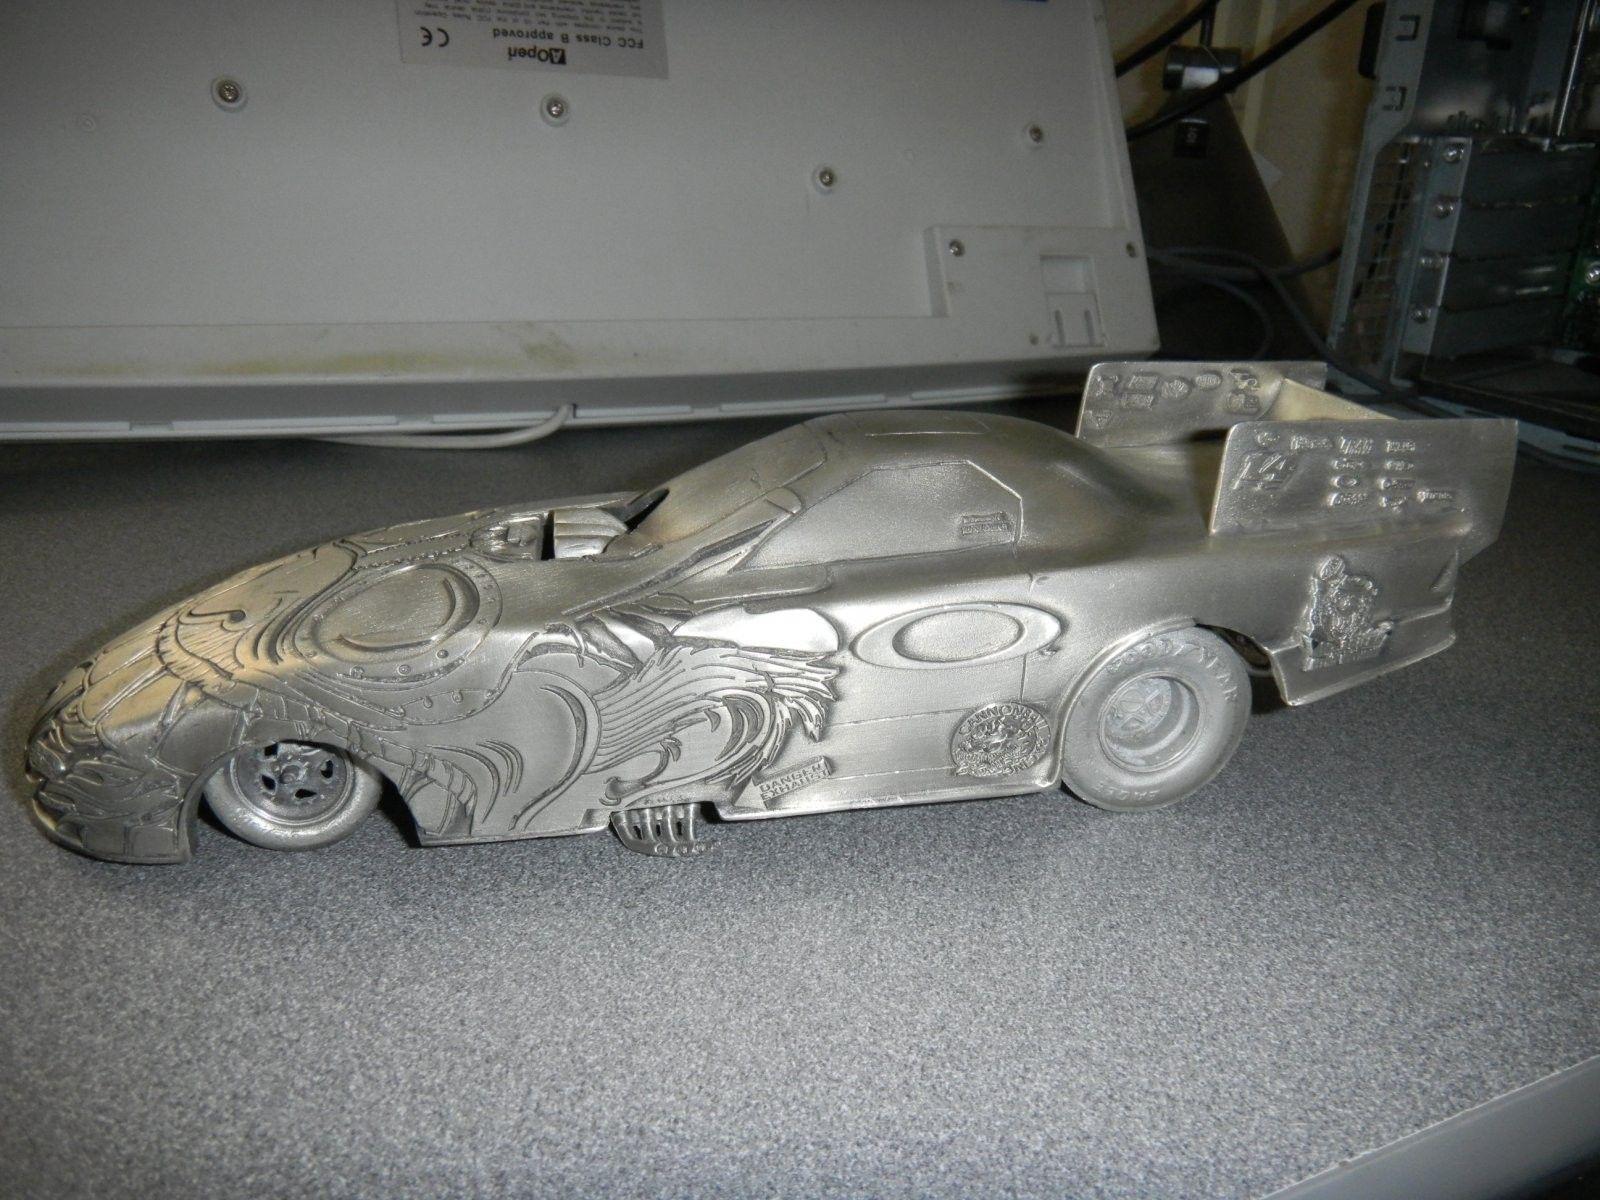 Scotty Cannon PEWTER Funny Car - DSCN1677.JPG